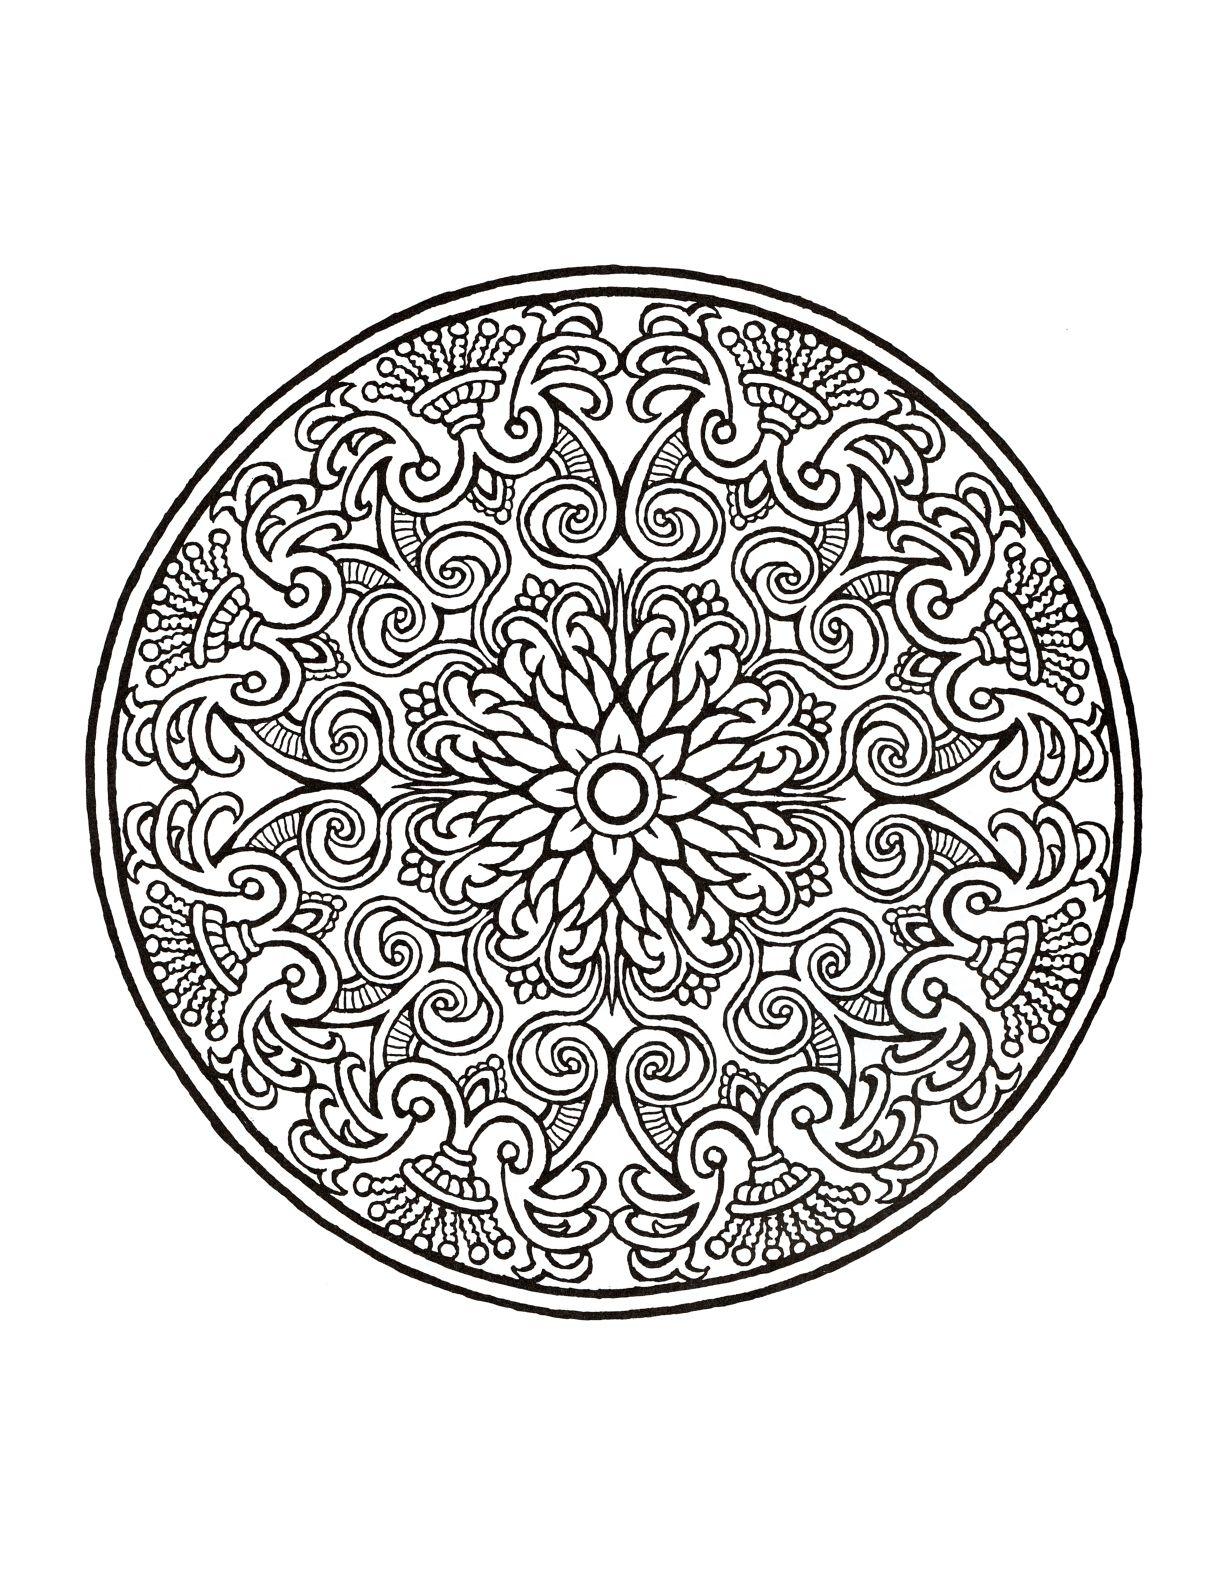 Mystical Mandala Coloring Book | Dover Coloring | Pinterest ...